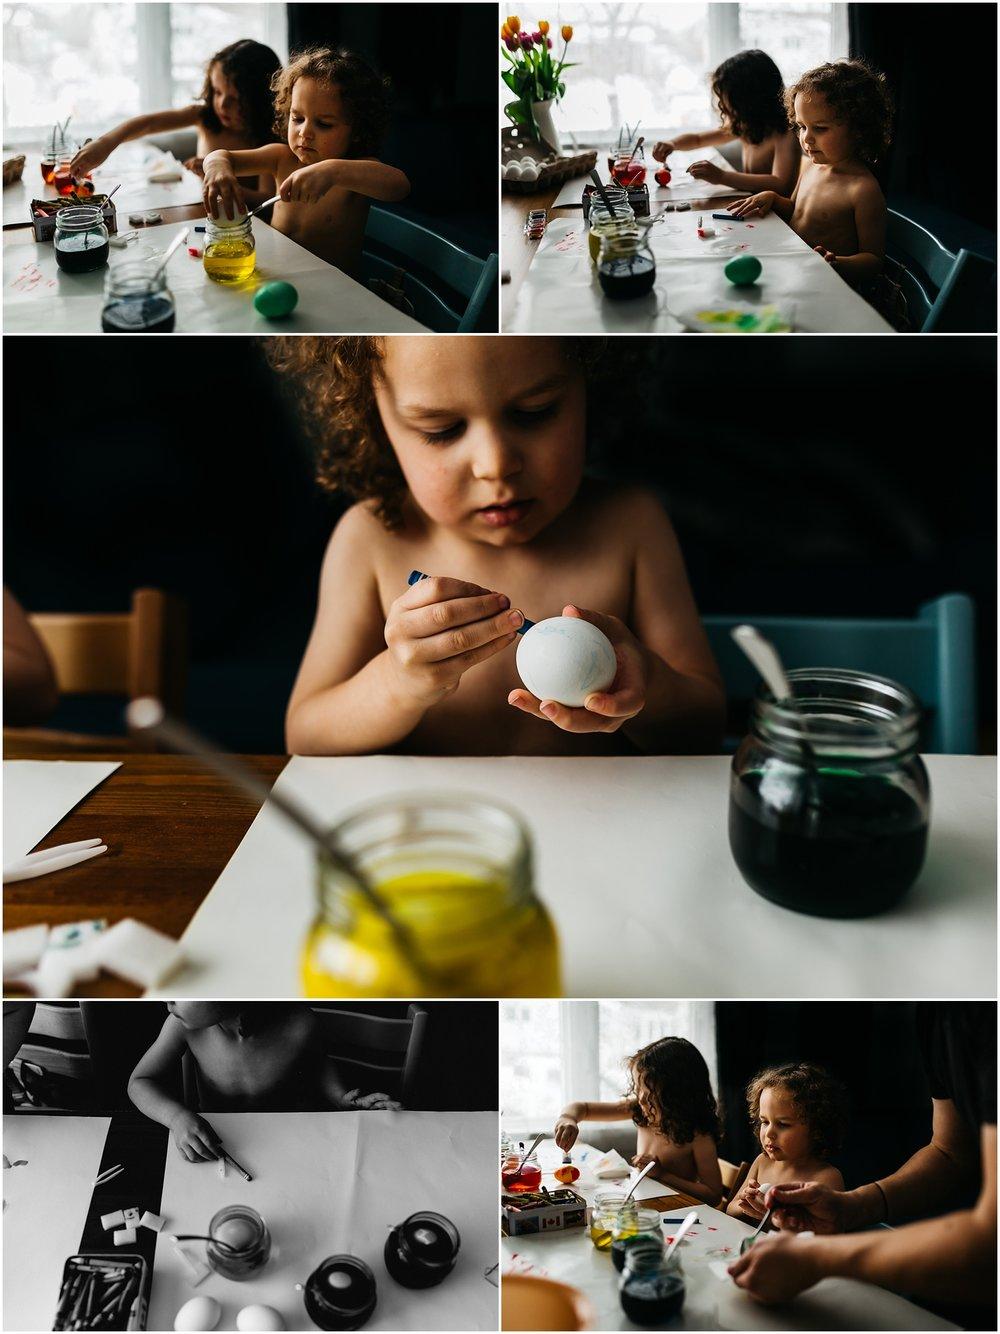 Easter Egg Painting - Edmonton Photographer - Edmonton Family Photographer -  Easter Eggs - Easter 2018 - Crayons on Easter Eggs - Edmonton Documentary Photographer - Family Photography - Documentary Photography